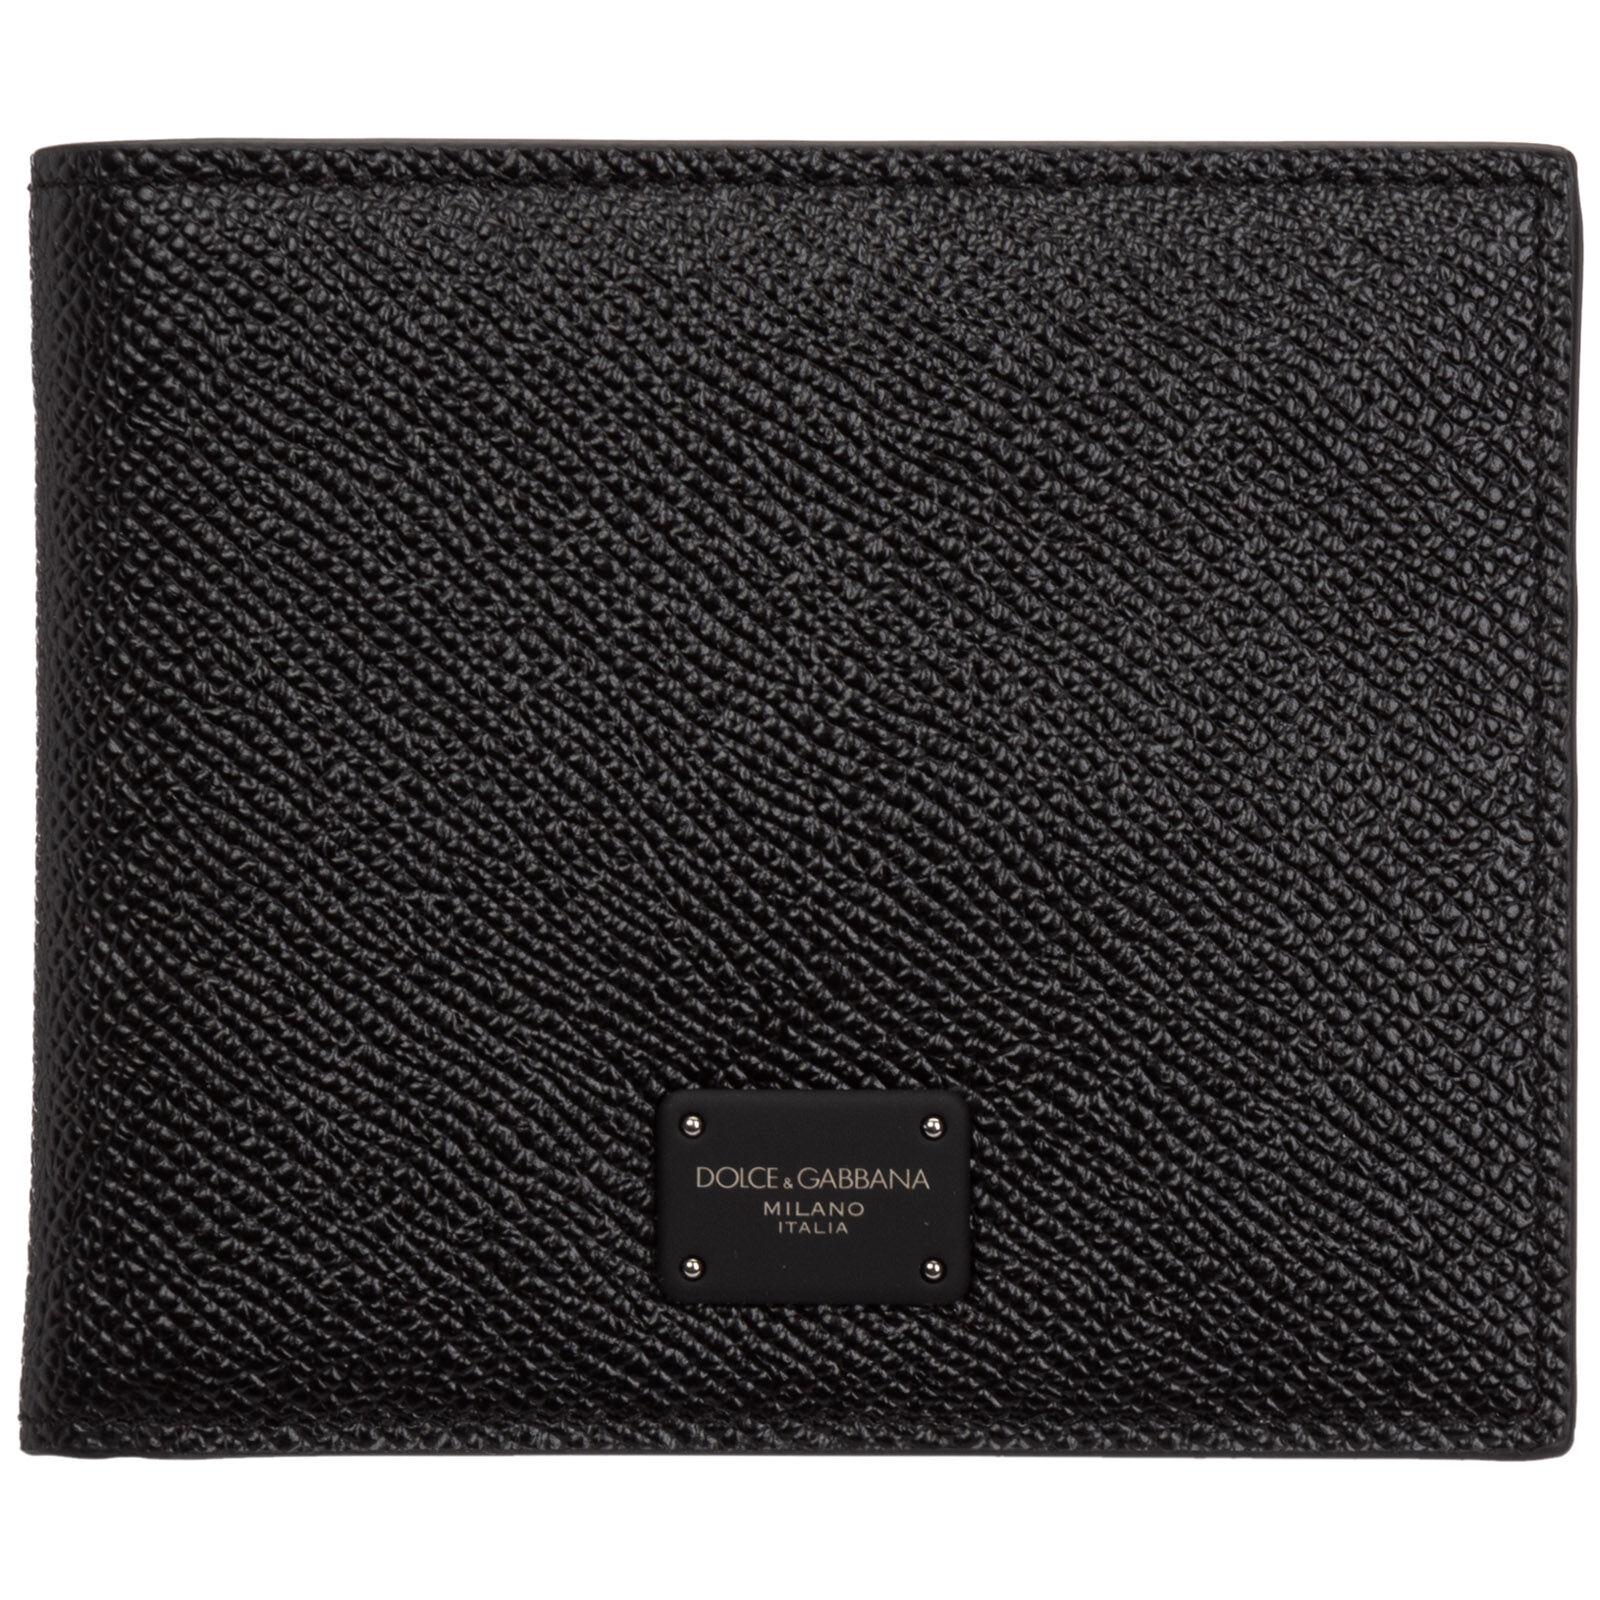 Dolce & Gabbana Men's genuine leather wallet credit card bifold  - Black